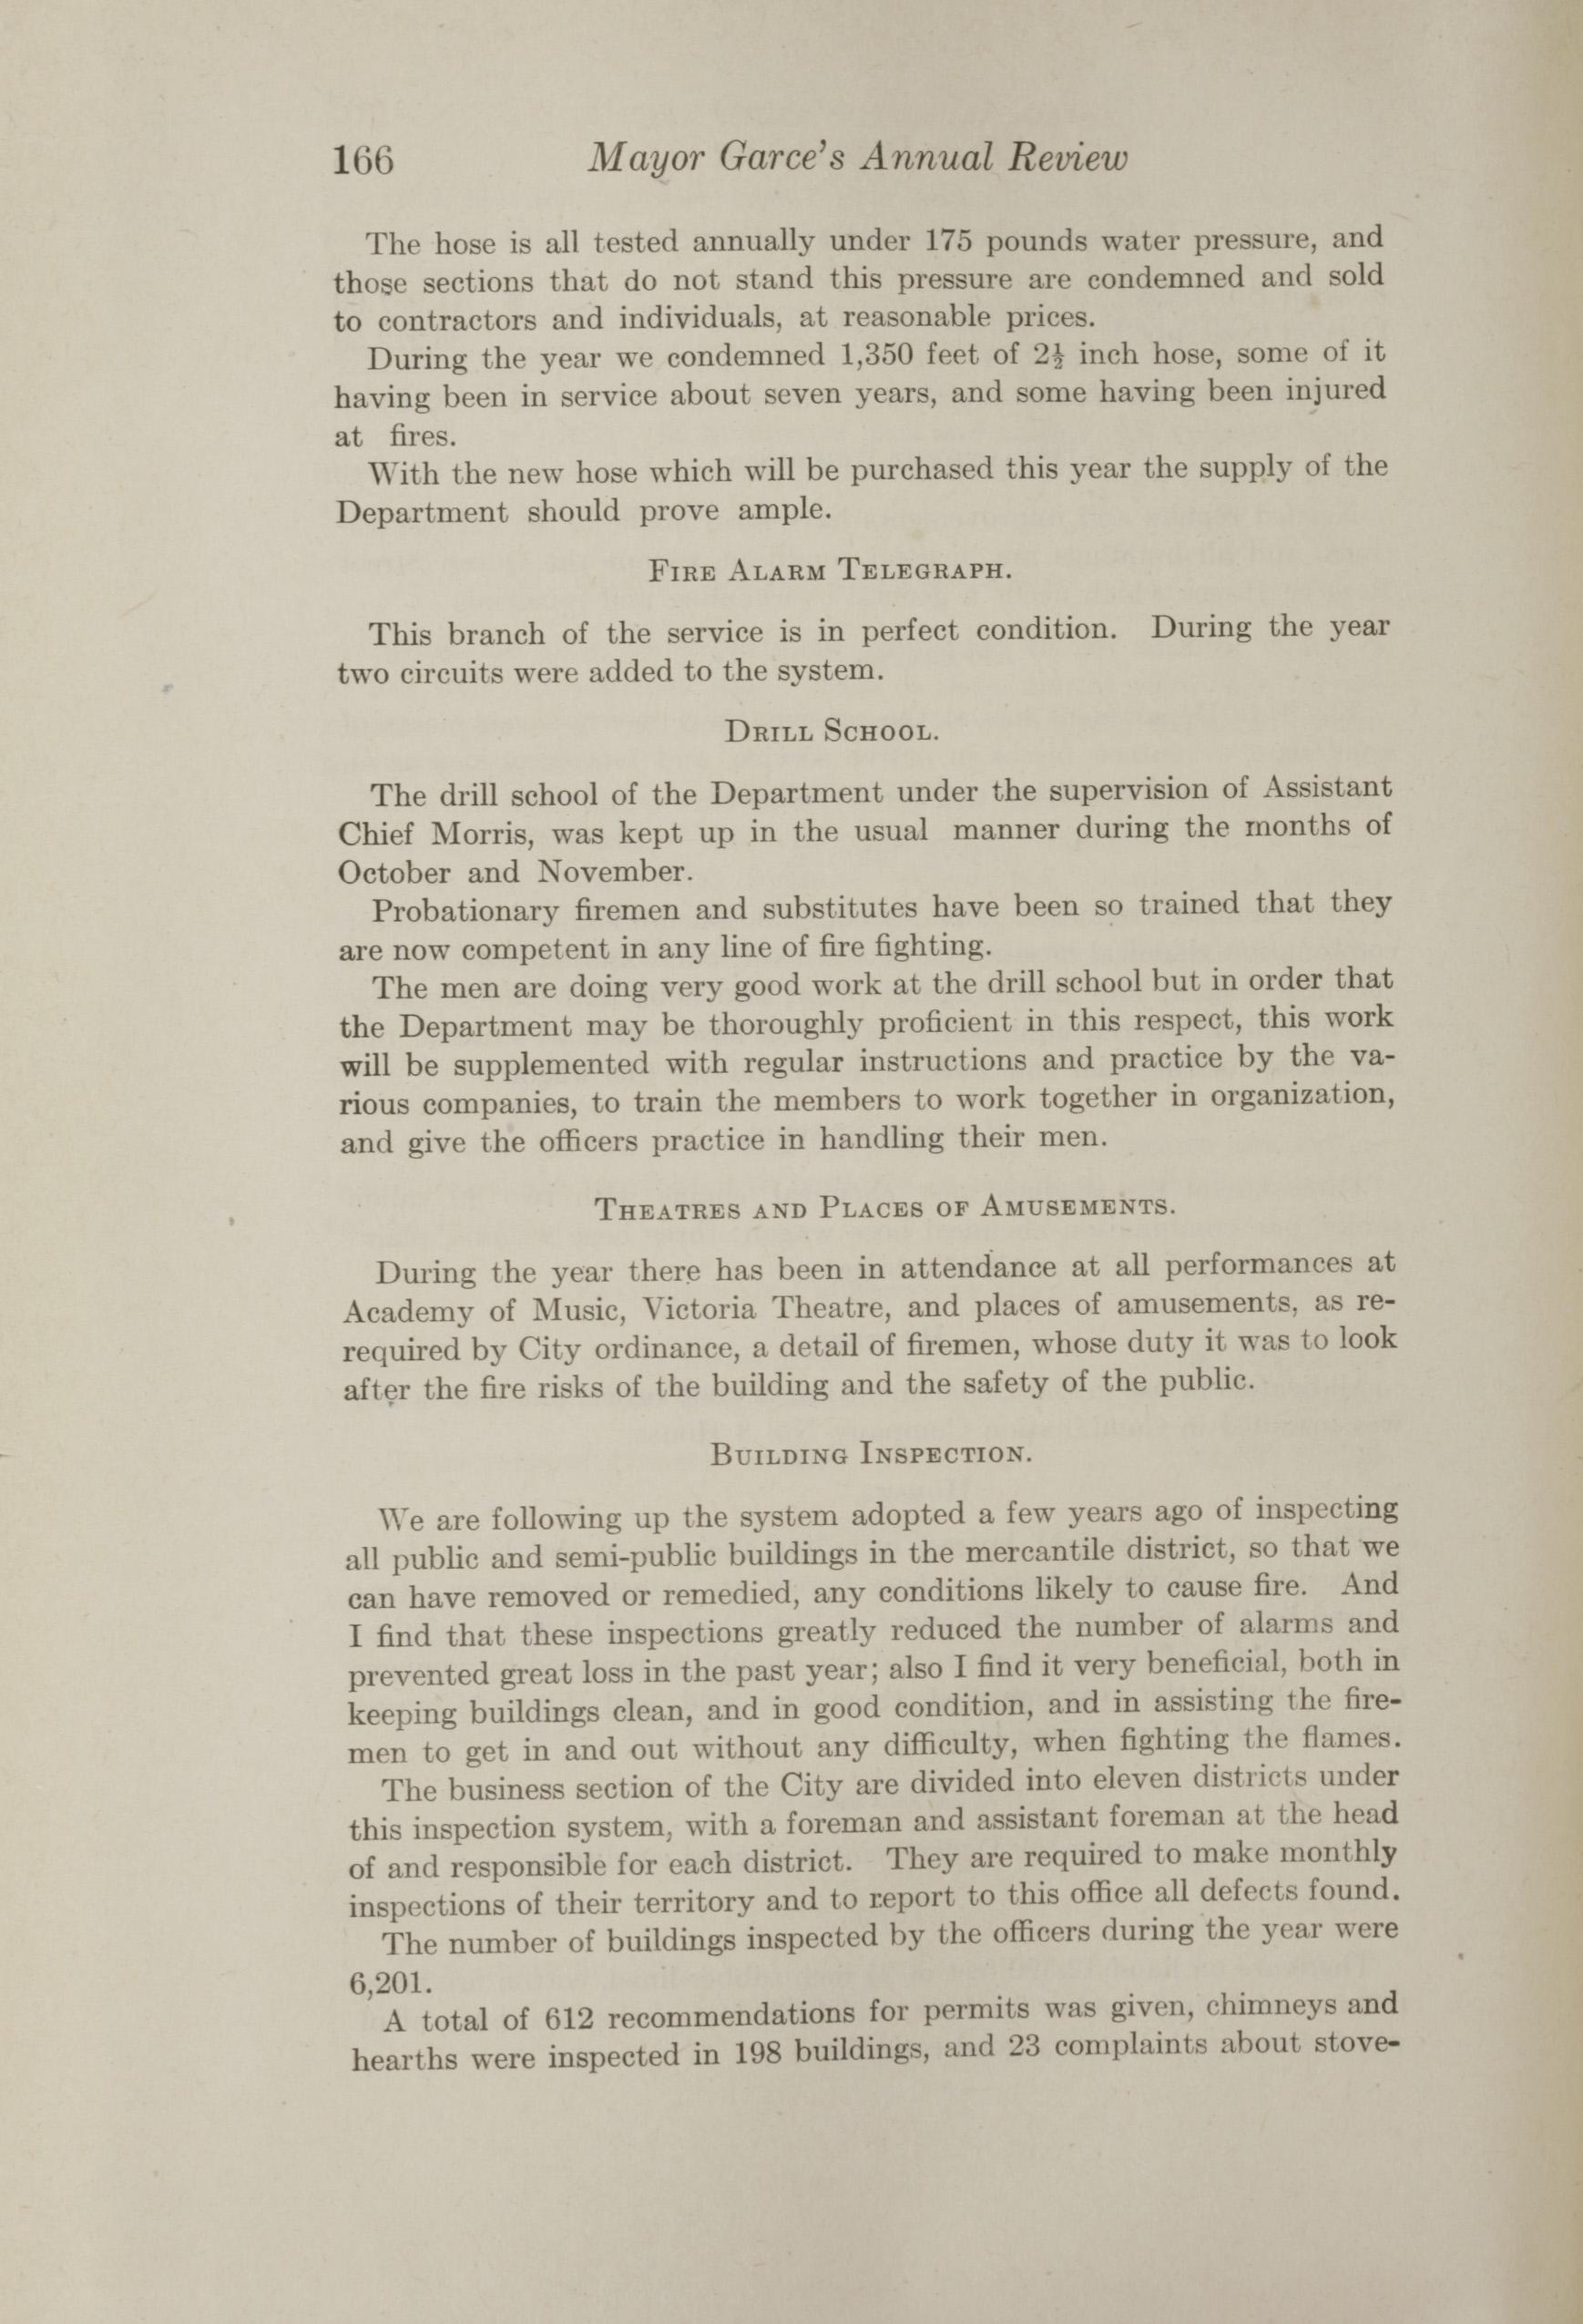 Charleston Yearbook, 1912, page 166